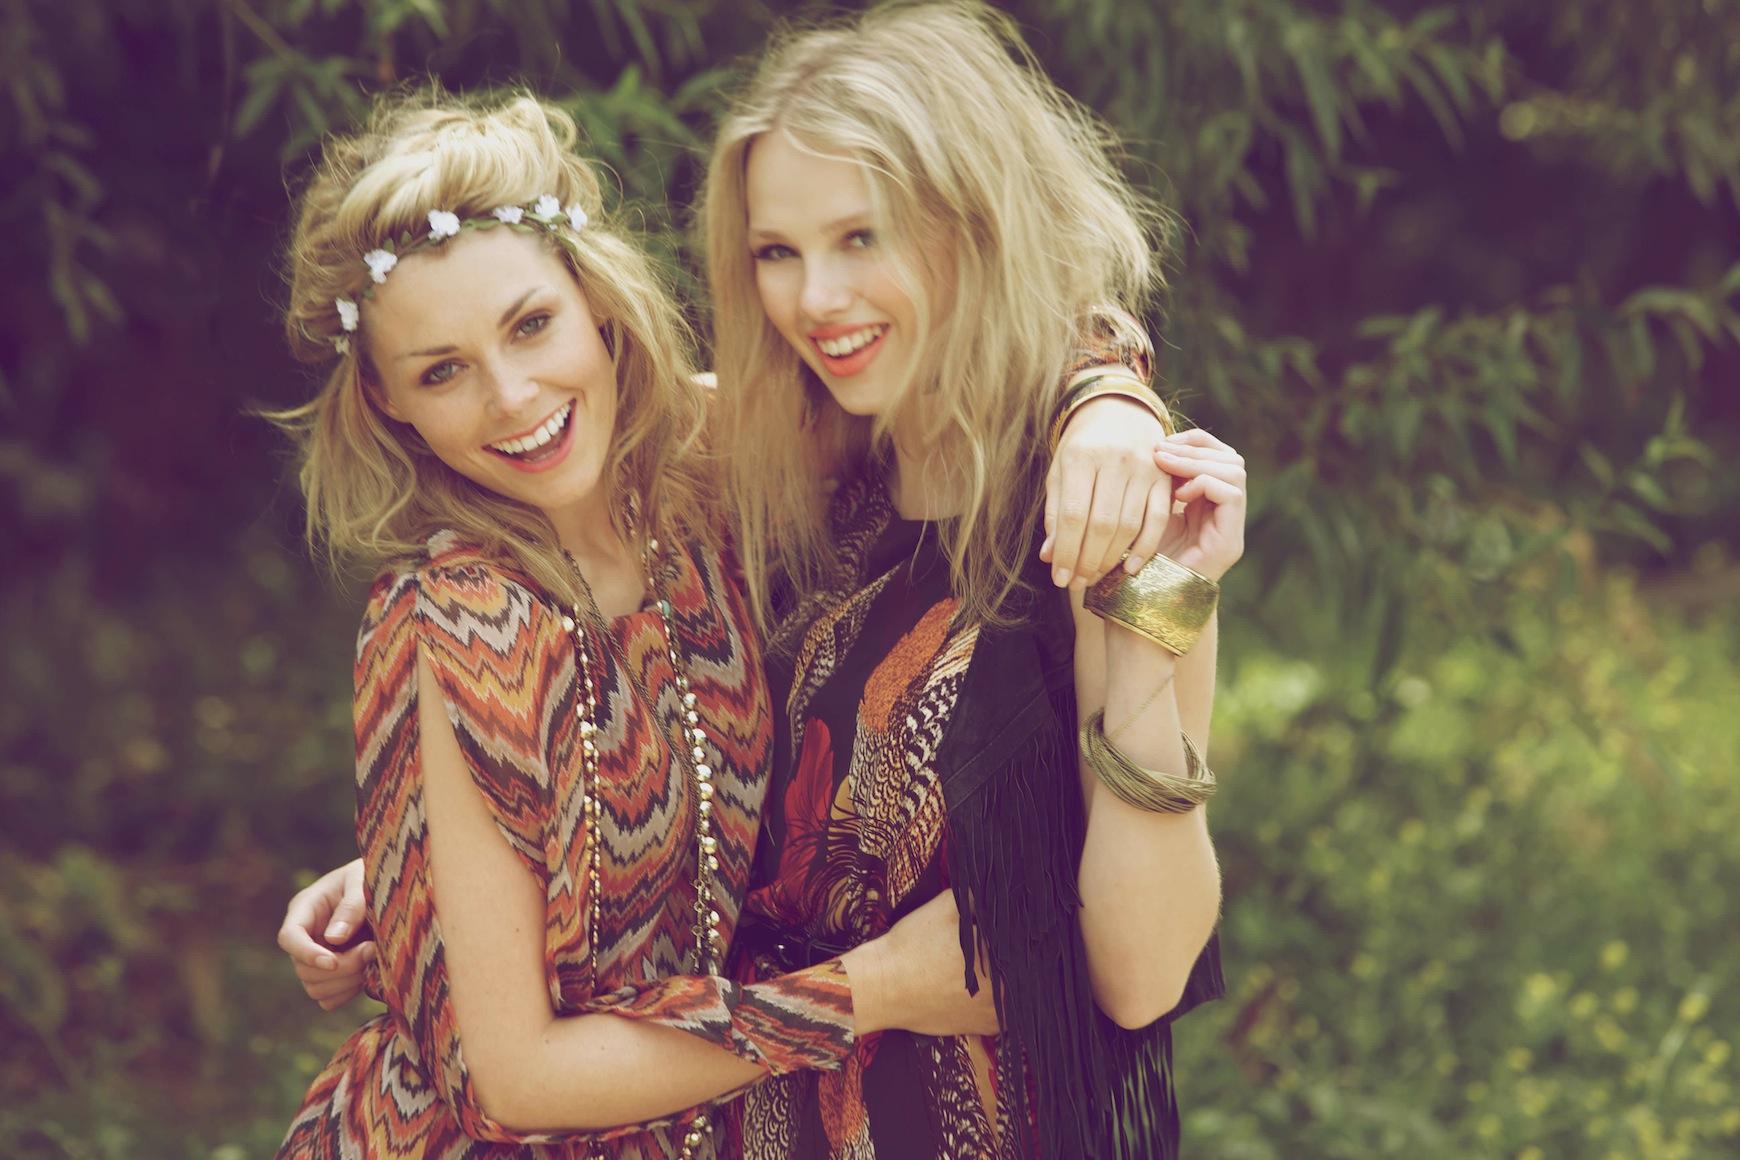 Nicola-Sloan-Fab-Festival-Hair-Tips-6